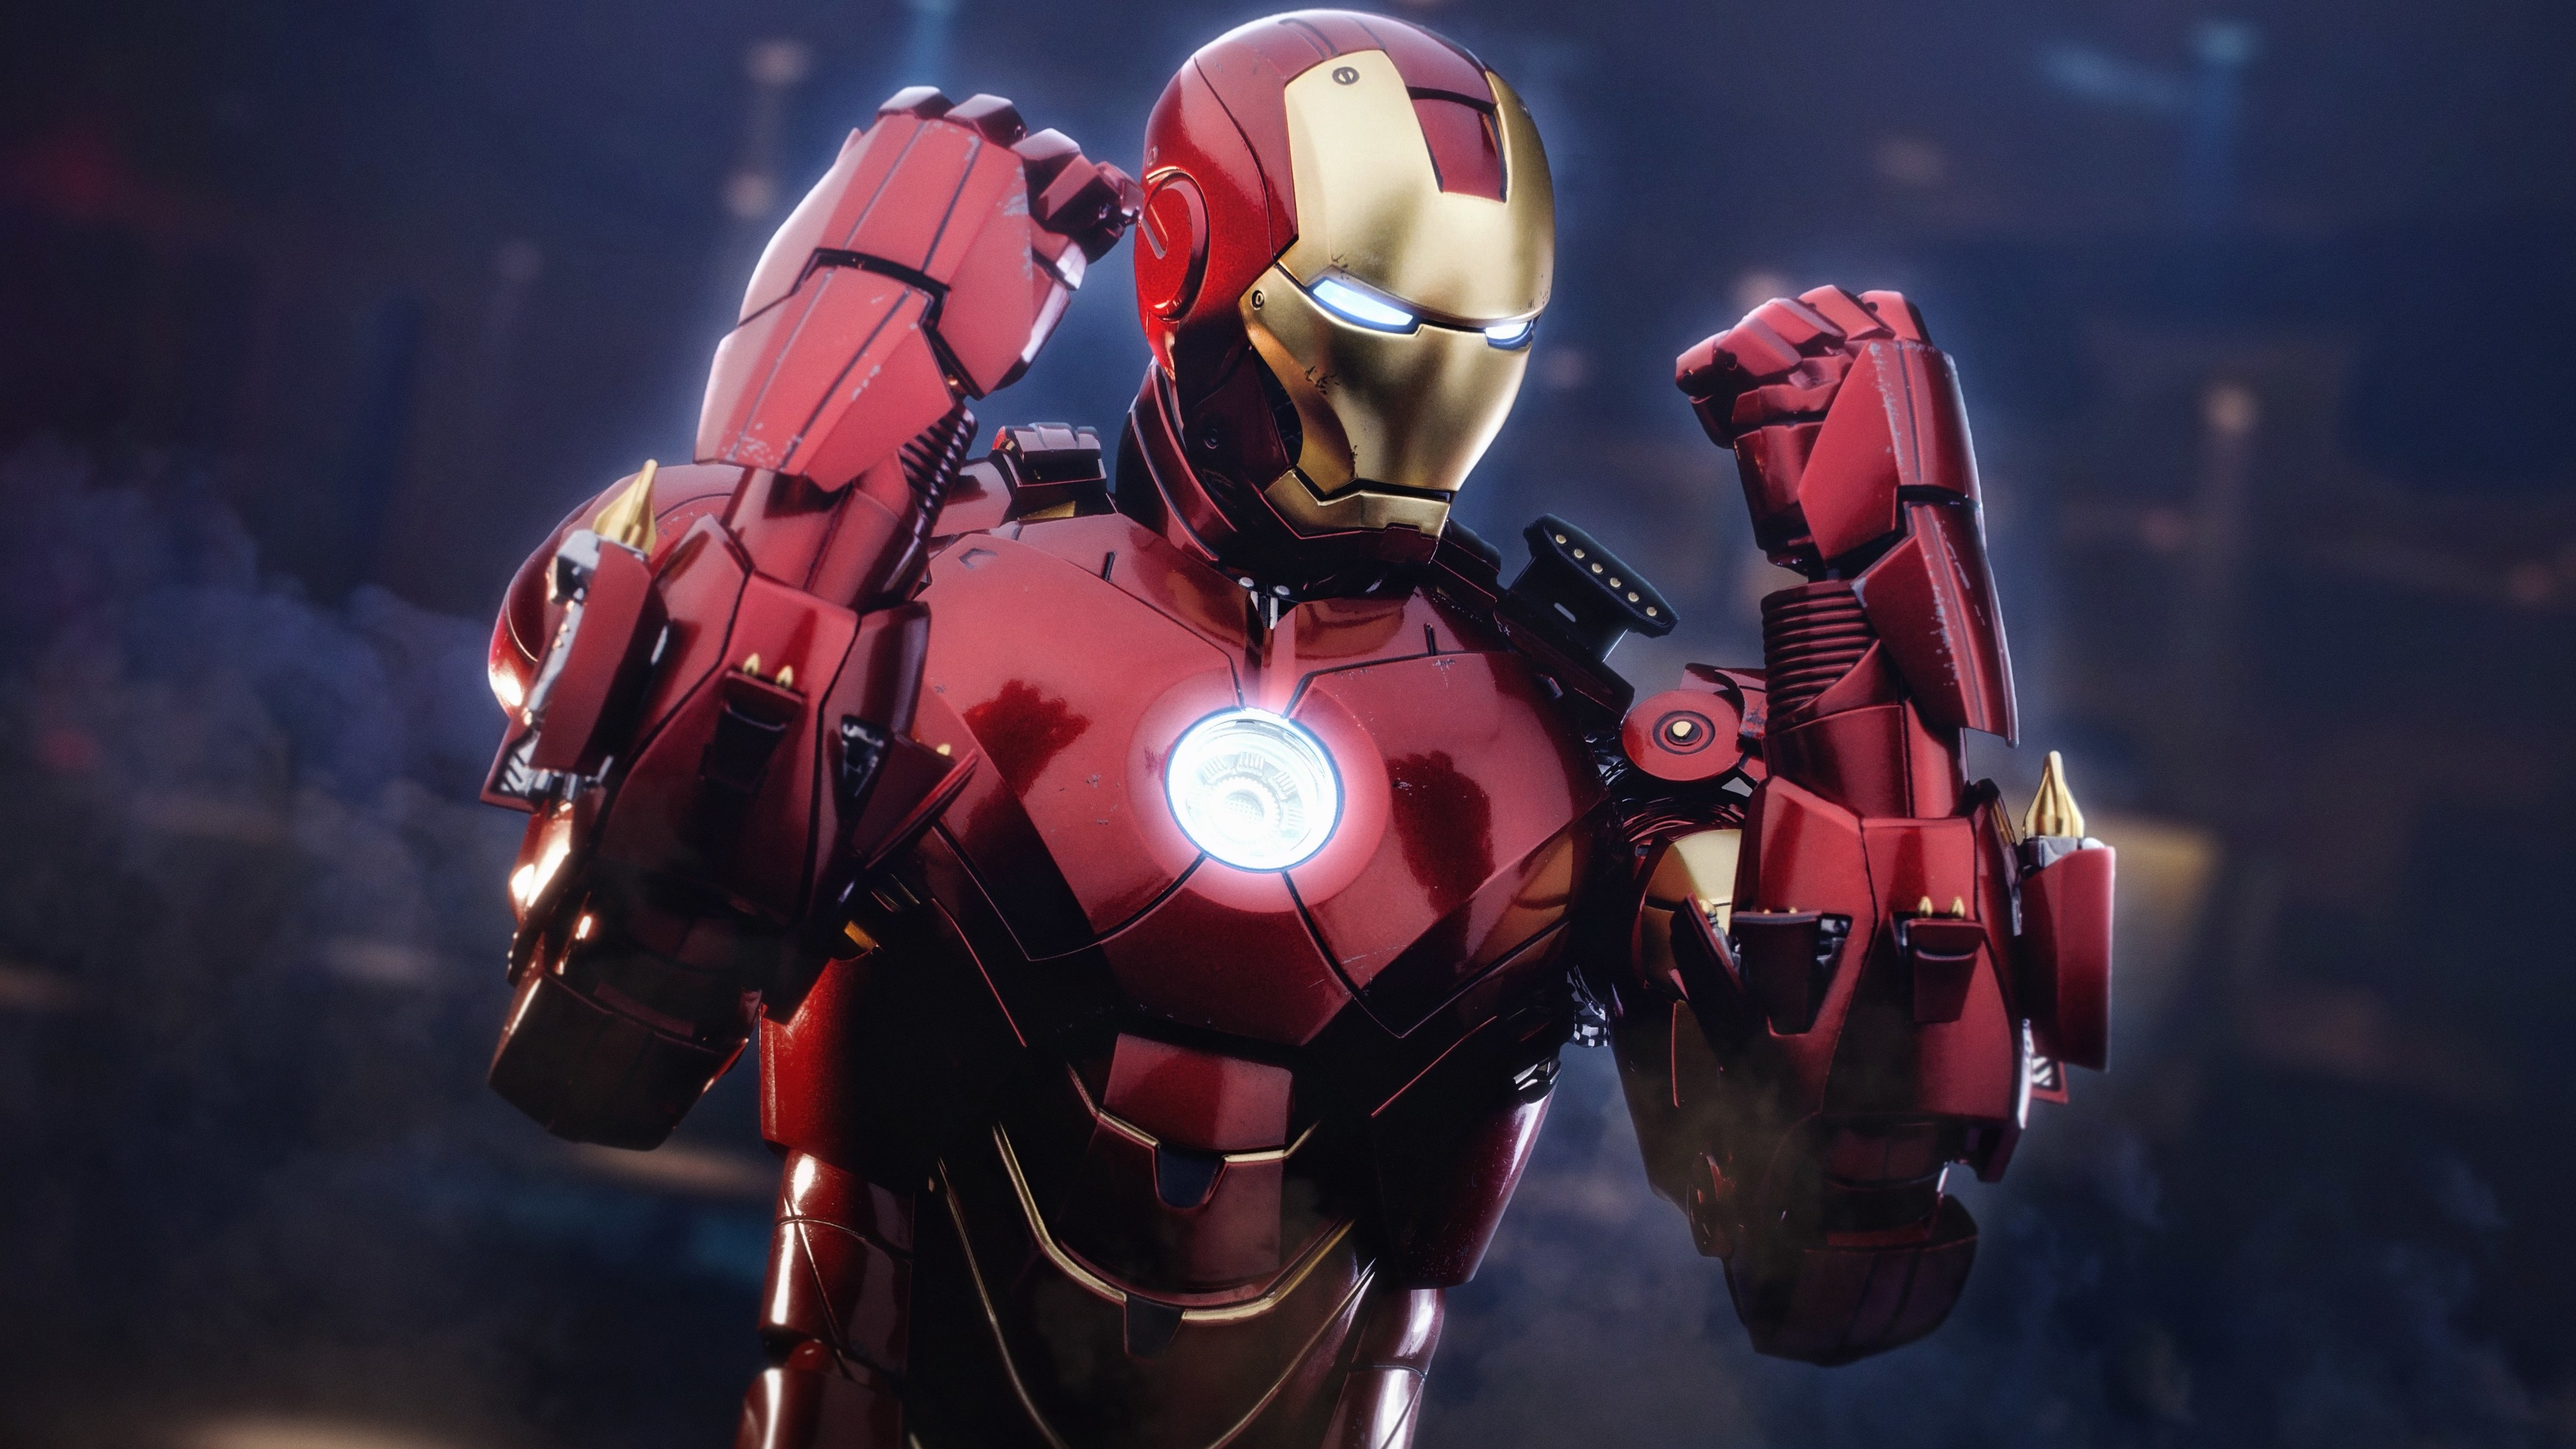 Wallpaper 4k Iron Man Mark 4 Suit 5k 4k Wallpapers 5k Wallpapers